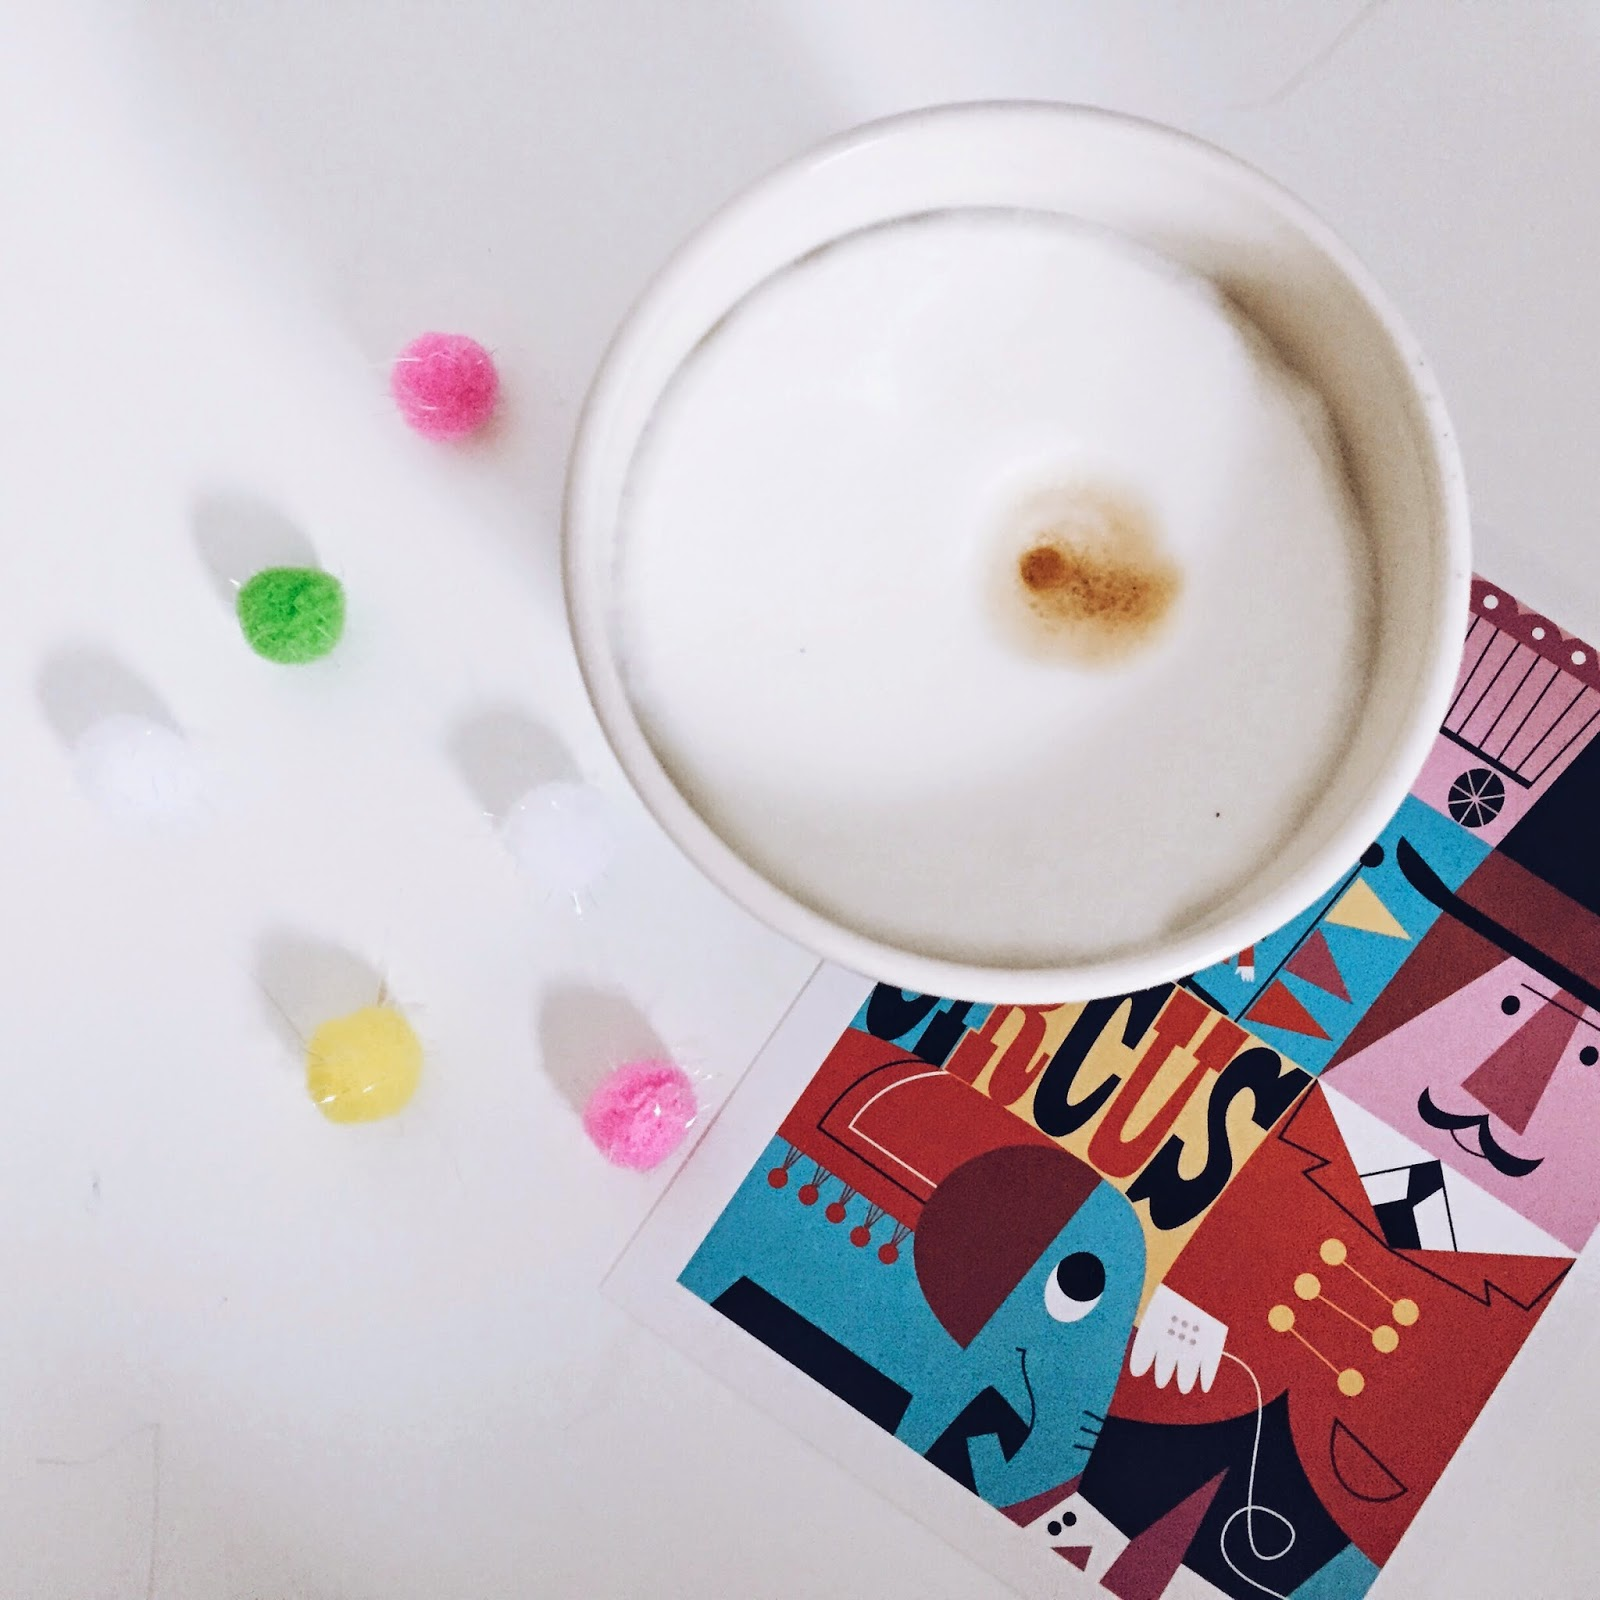 kaffee pompom zirkus ninotschka